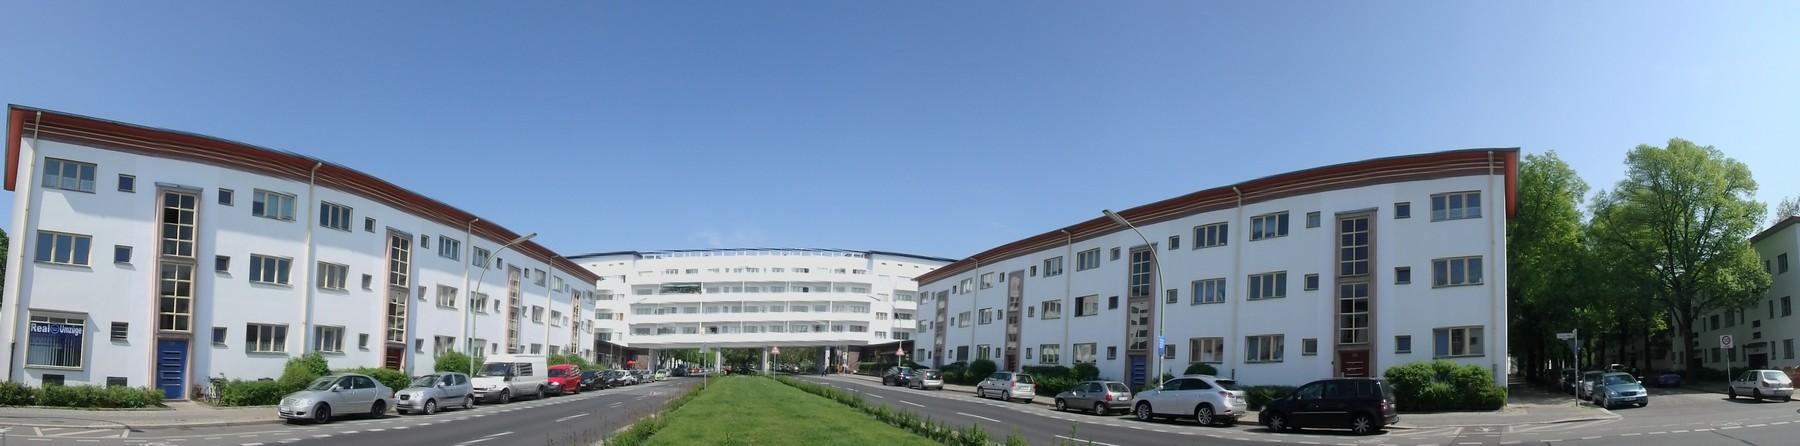 P4250134 Bloques de viviendas modernistas de Berlín Unesco Alemania